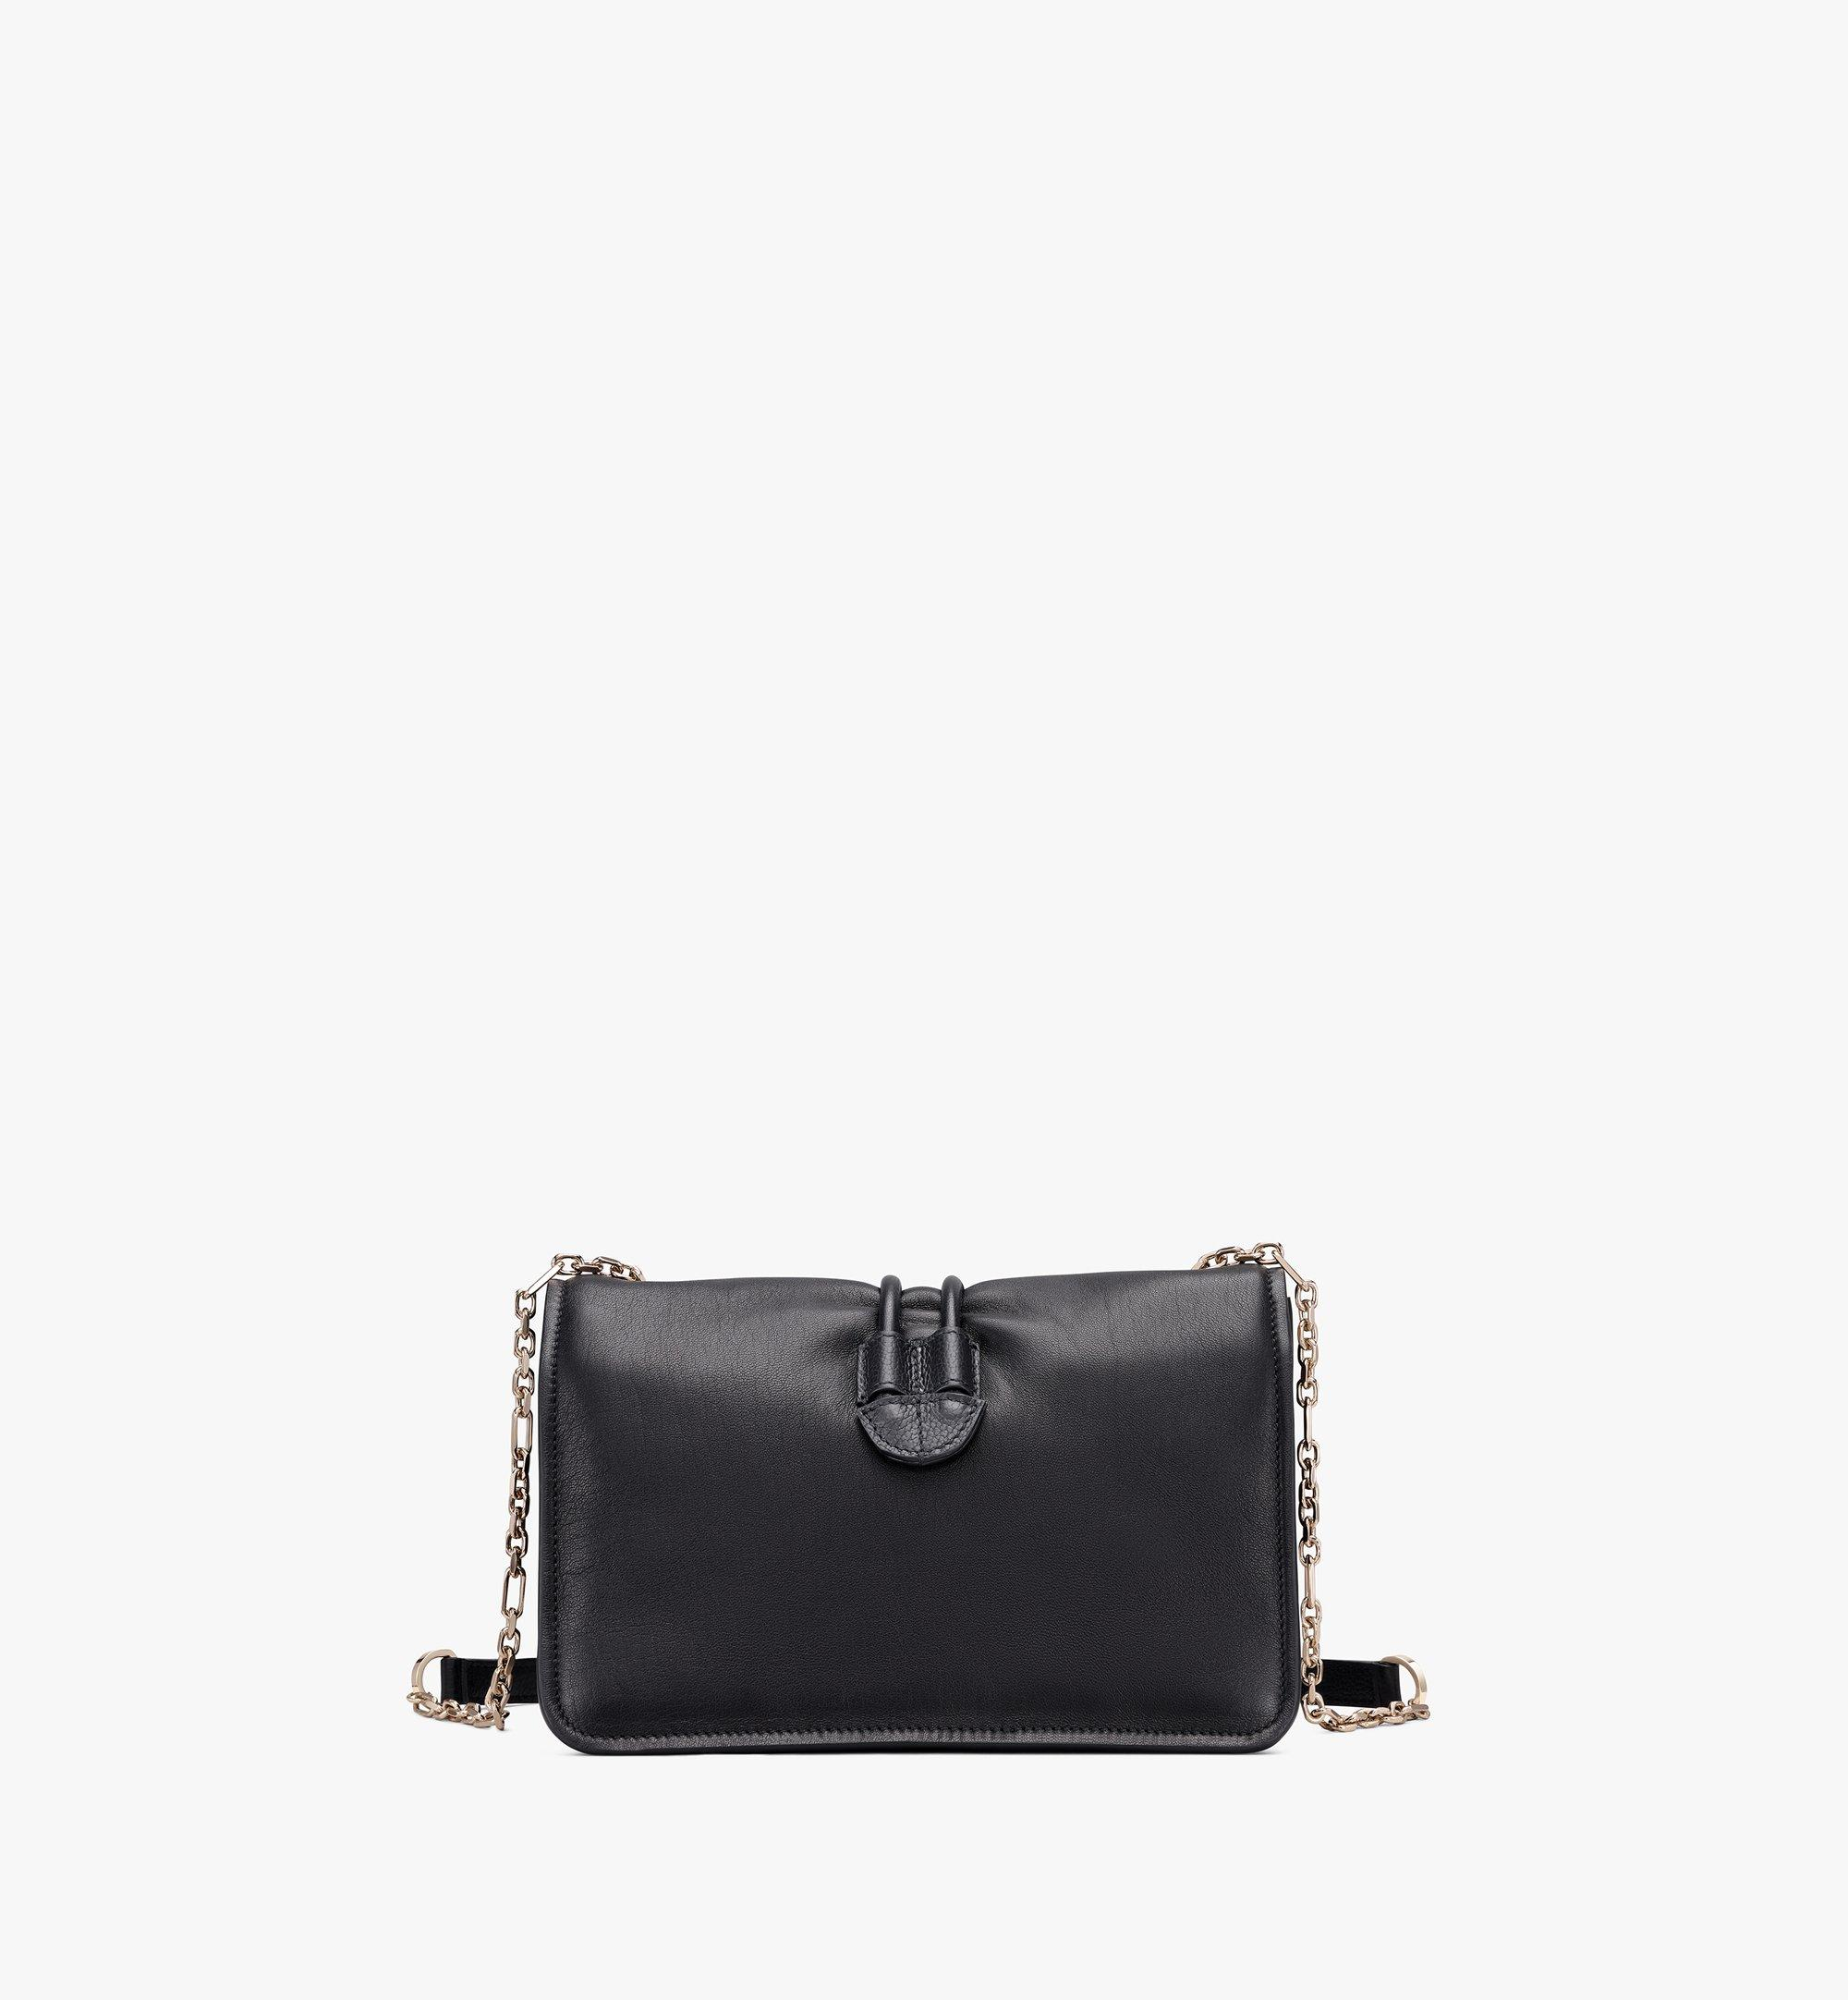 MCM Candy Shoulder Bag in Nappa Leather Black MWSASCY05BK001 Alternate View 3